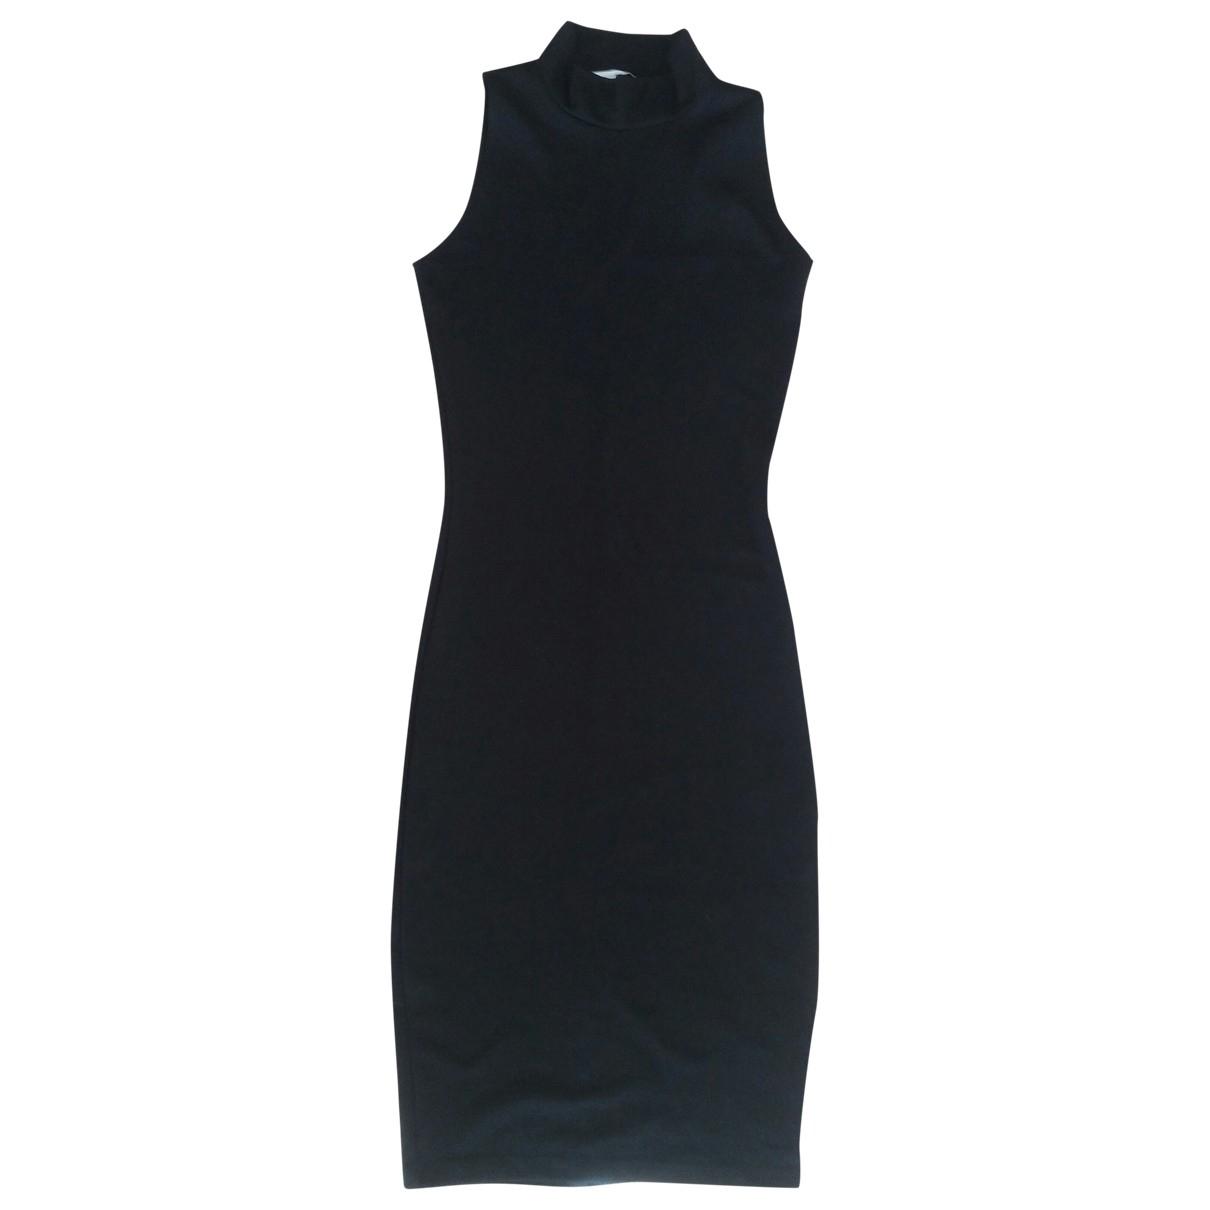 Zara \N Black Cotton - elasthane dress for Women S International